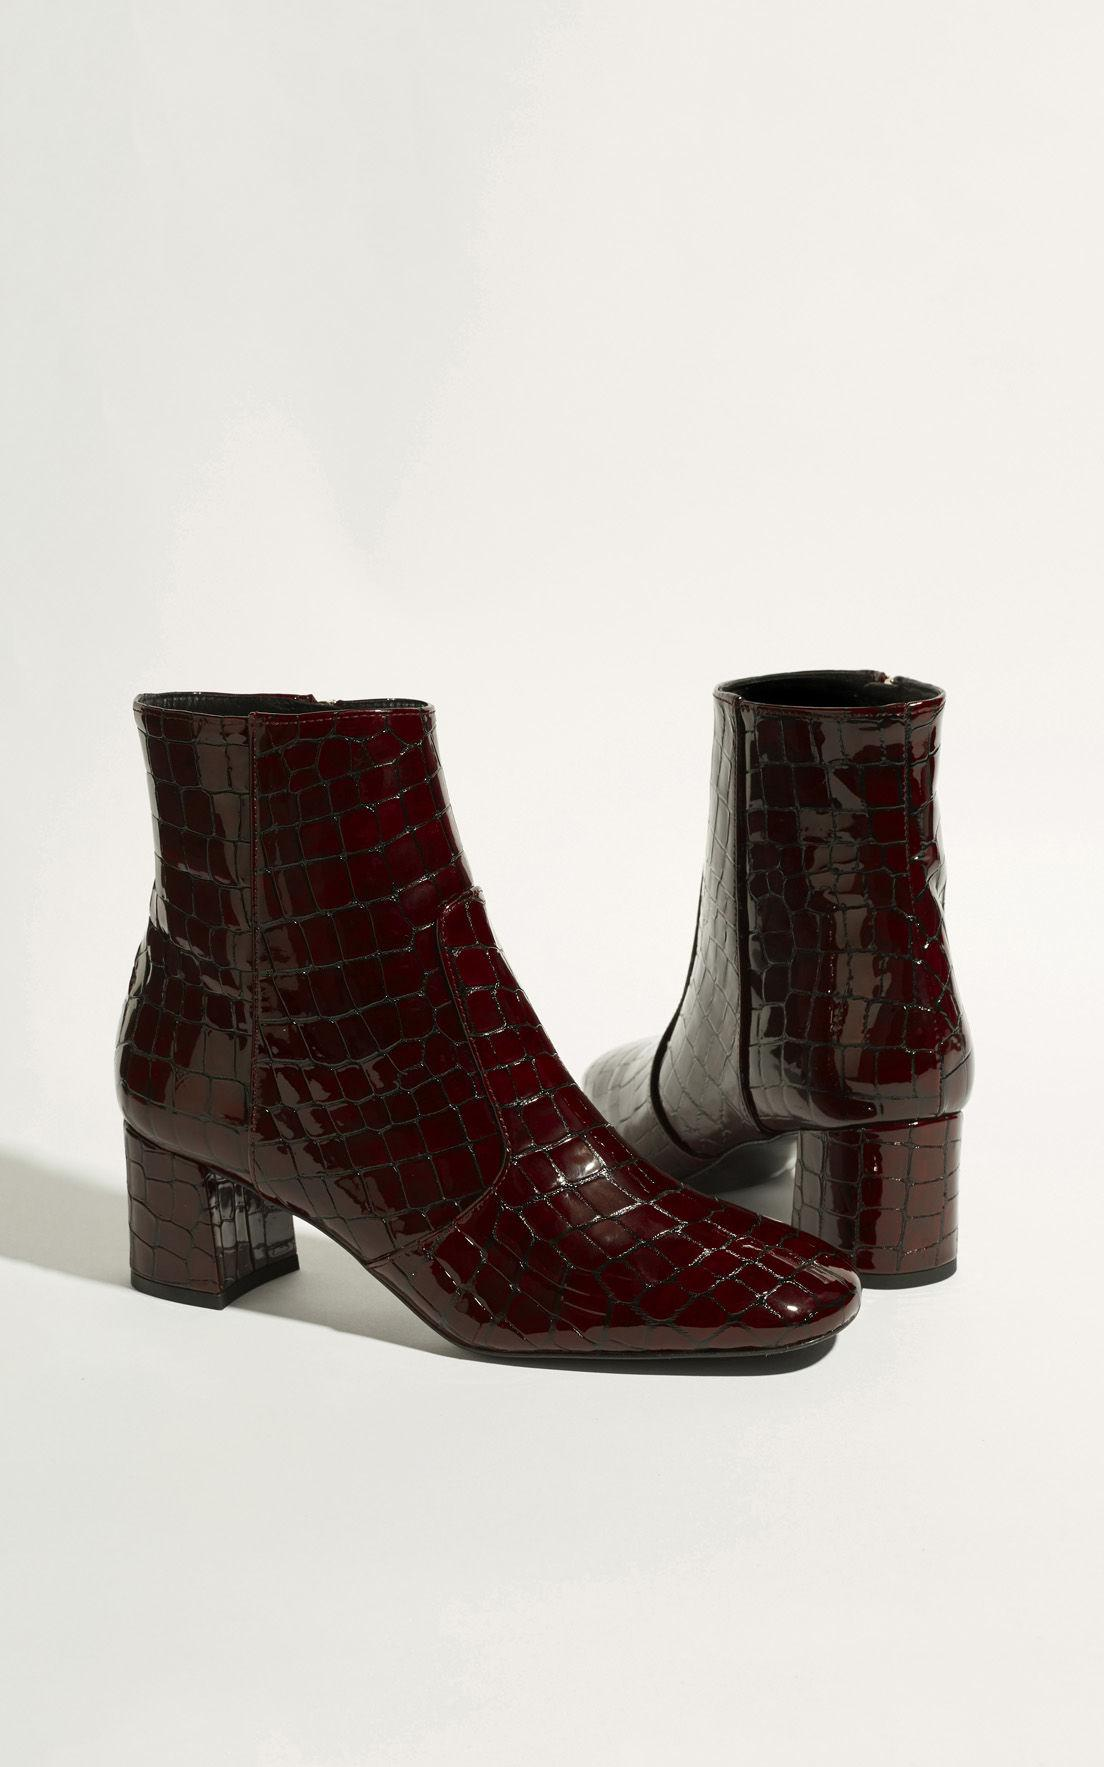 d9b99de501441 Karen Millen Leather Crocodile Ankle Boots - Dark Red in Red - Lyst